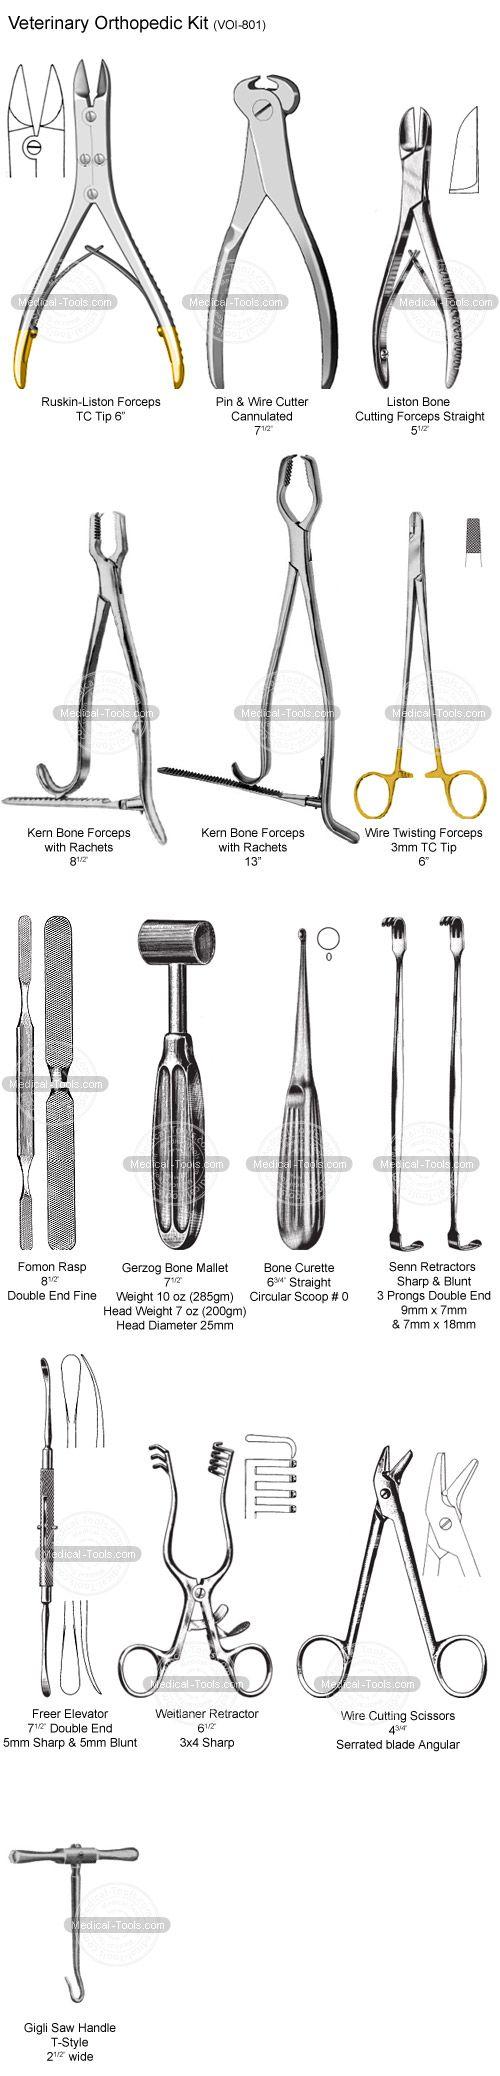 Veterinary Orthopedic Kit Veterinary Instruments Medical Tools Shop